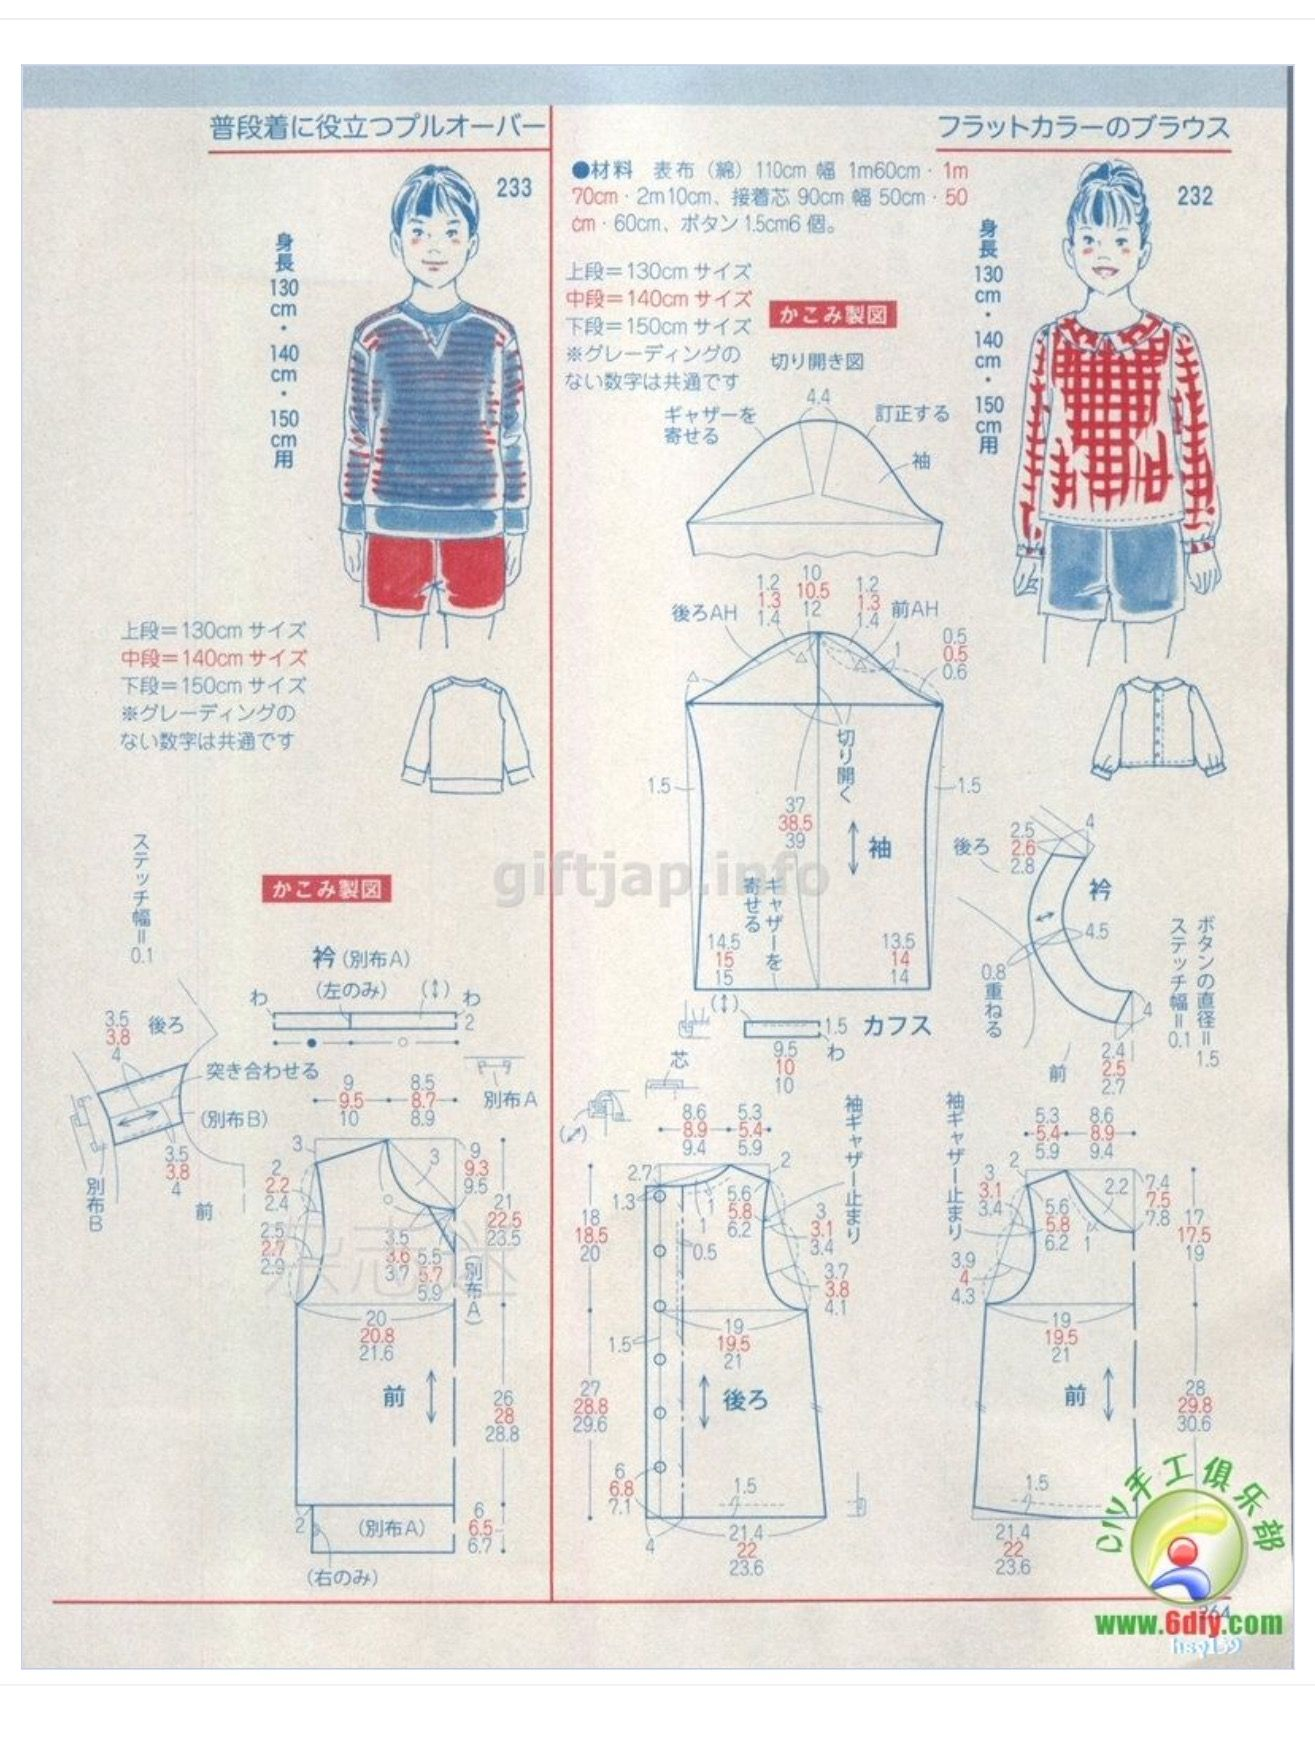 Pin de Chung Chiang Tai en 童裝   Pinterest   Costura y Bebe